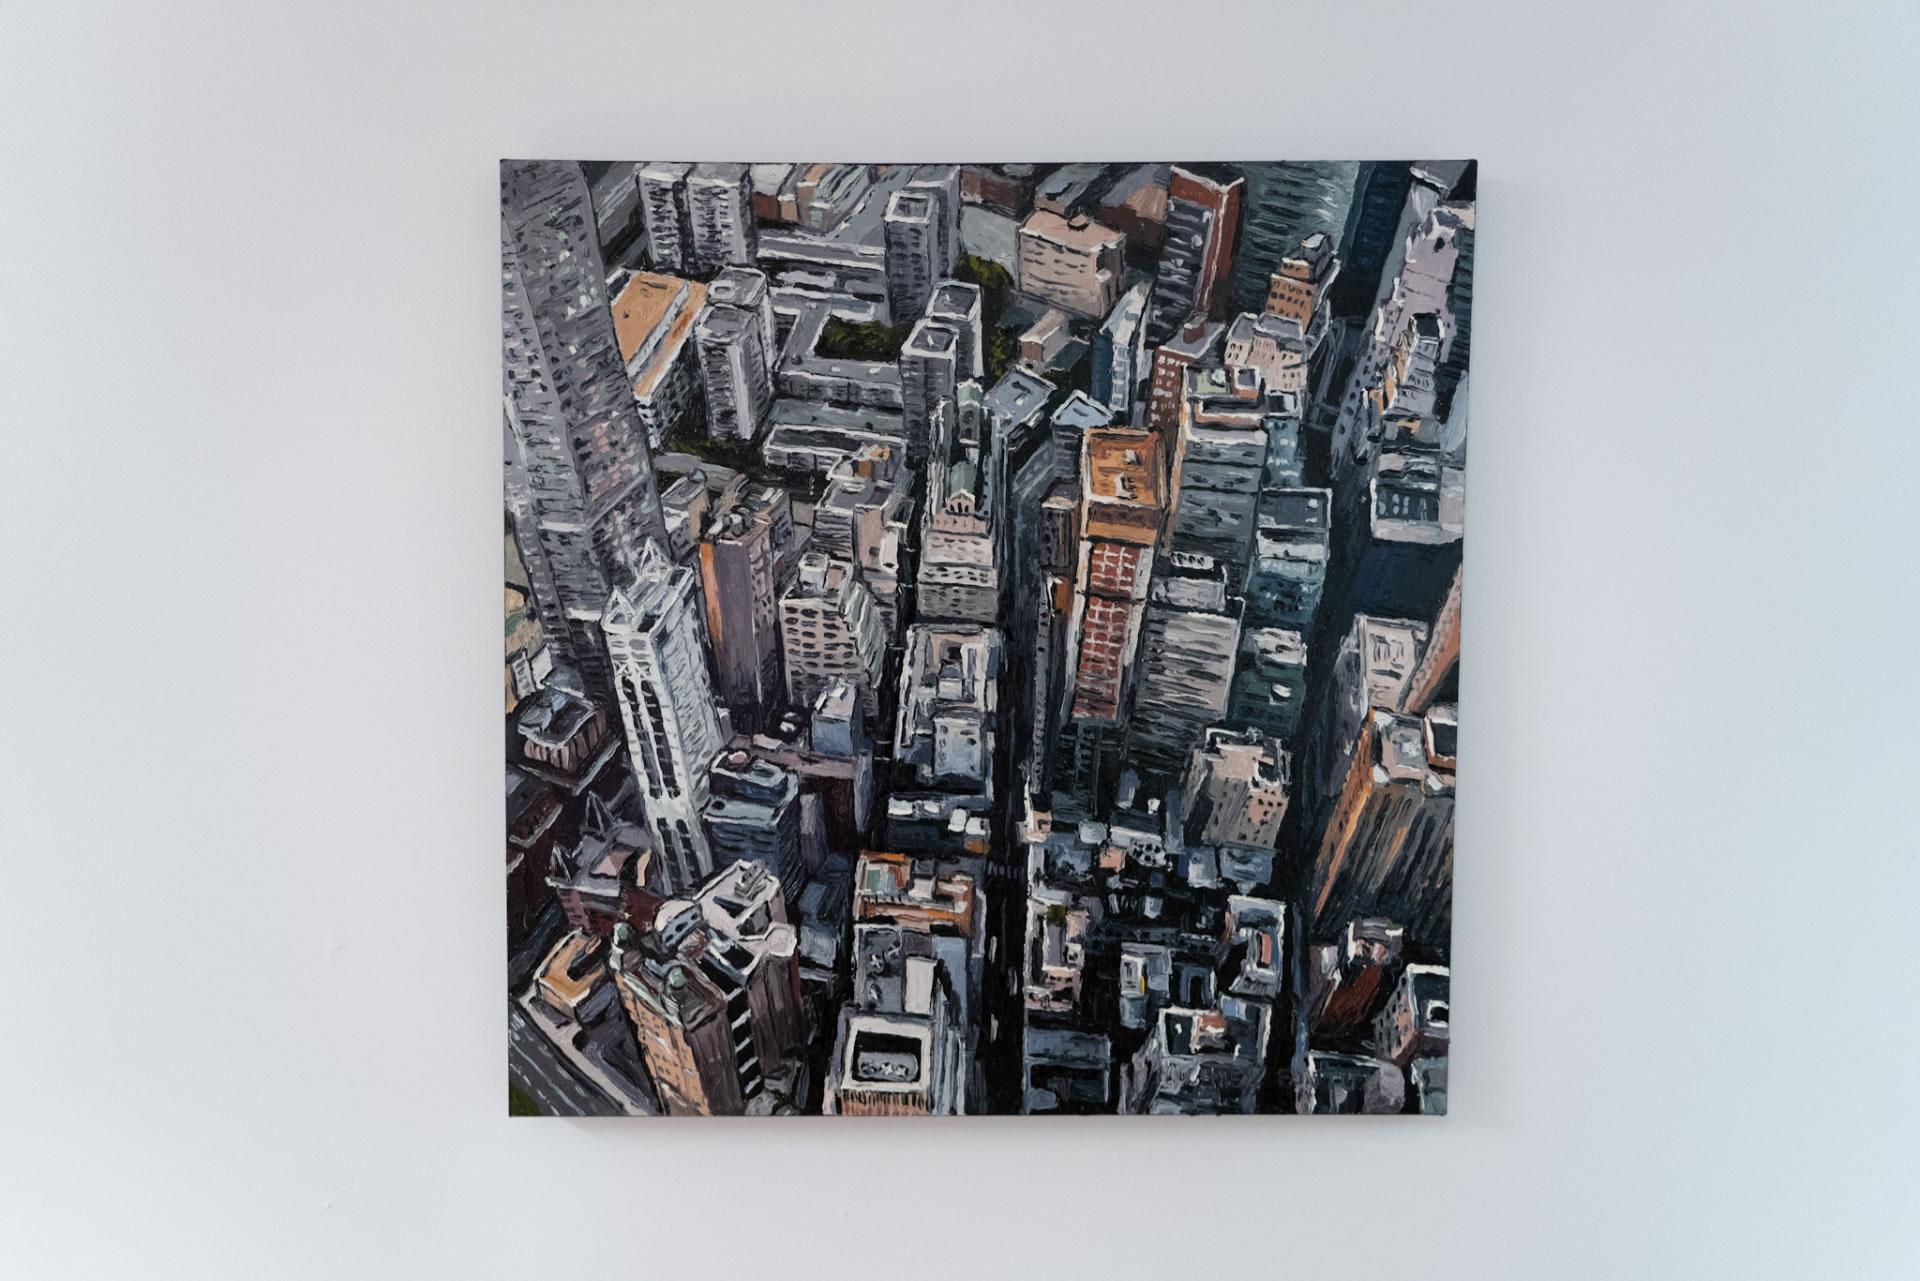 Mike-Fantuz-Up-Fulton-2020-oil-on-canvas-40x40-4000-Front-Online-Art-Galleries